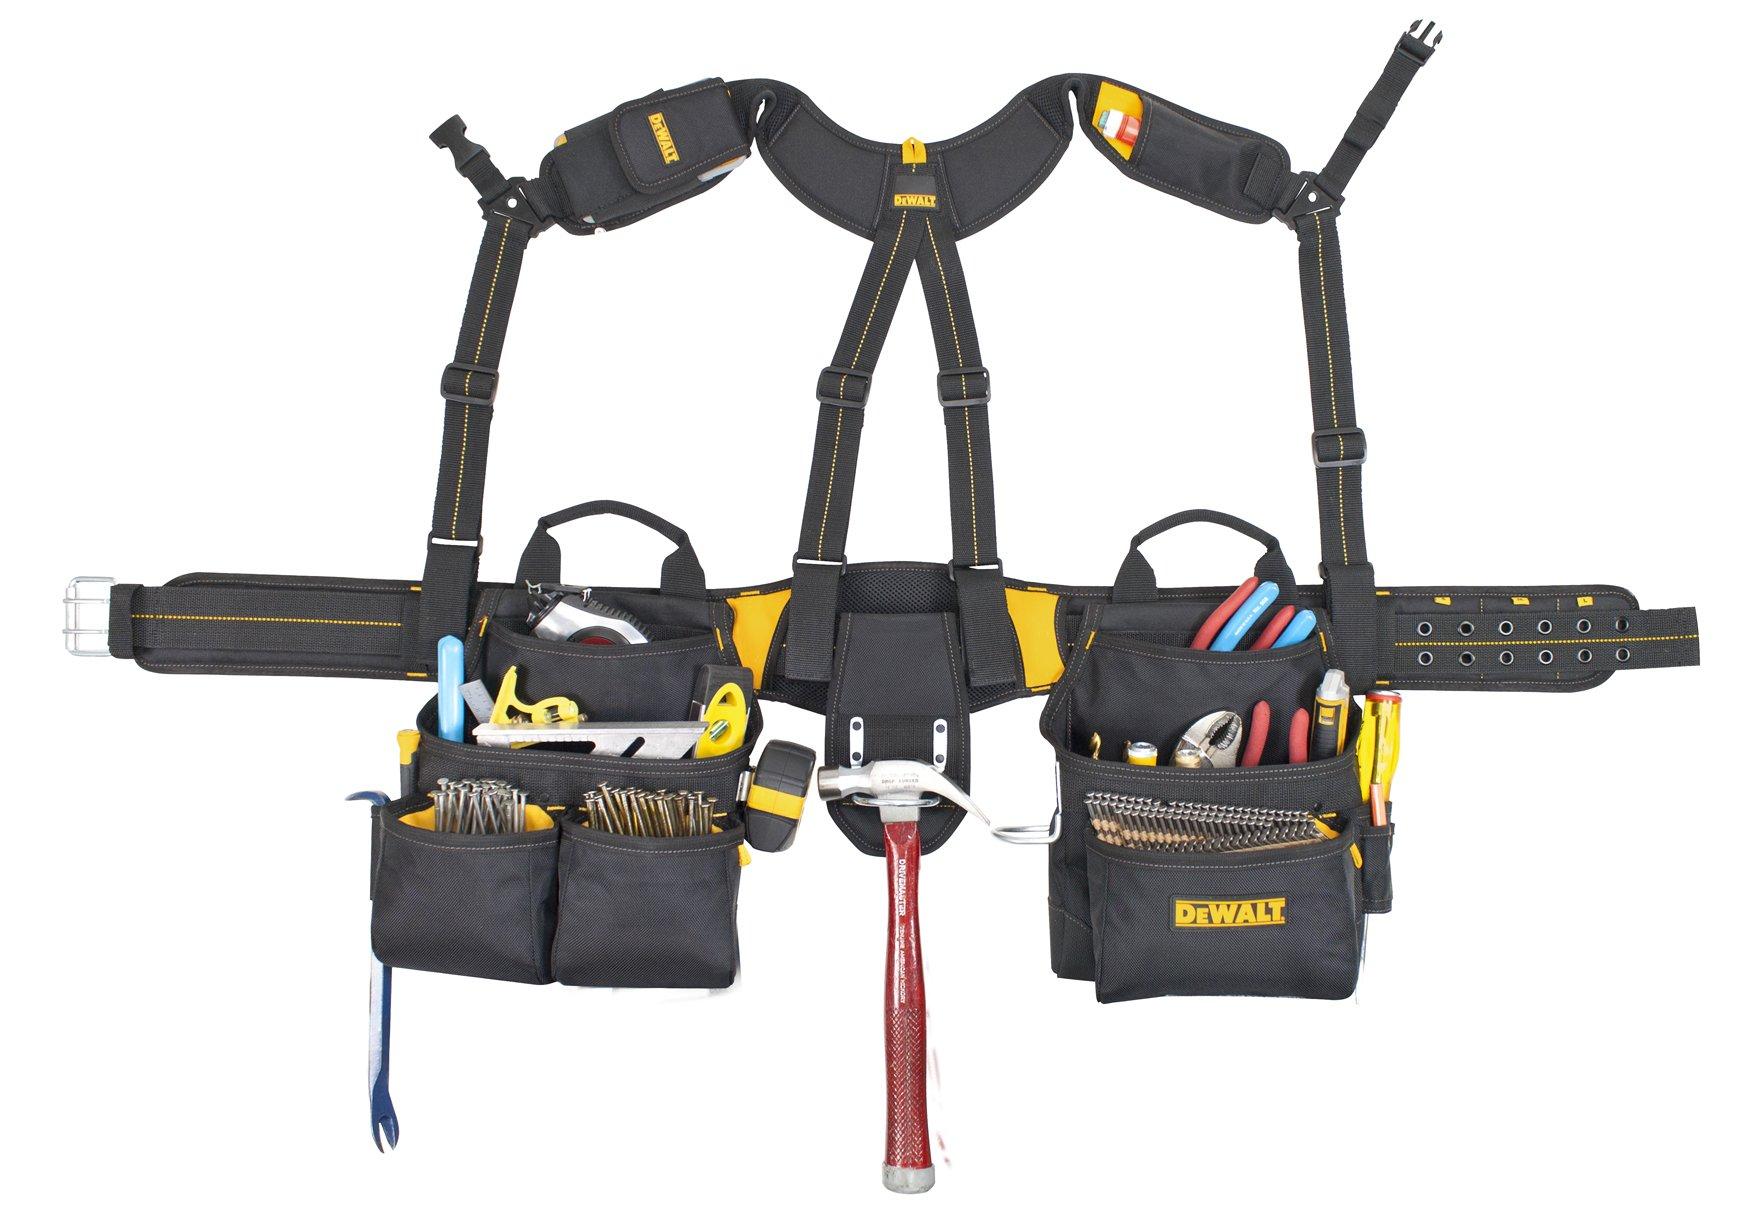 DEWALT DG5617 20-Pocket Pro Framer's Combo Apron Tool Belt and Yoke-style Suspenders by DEWALT